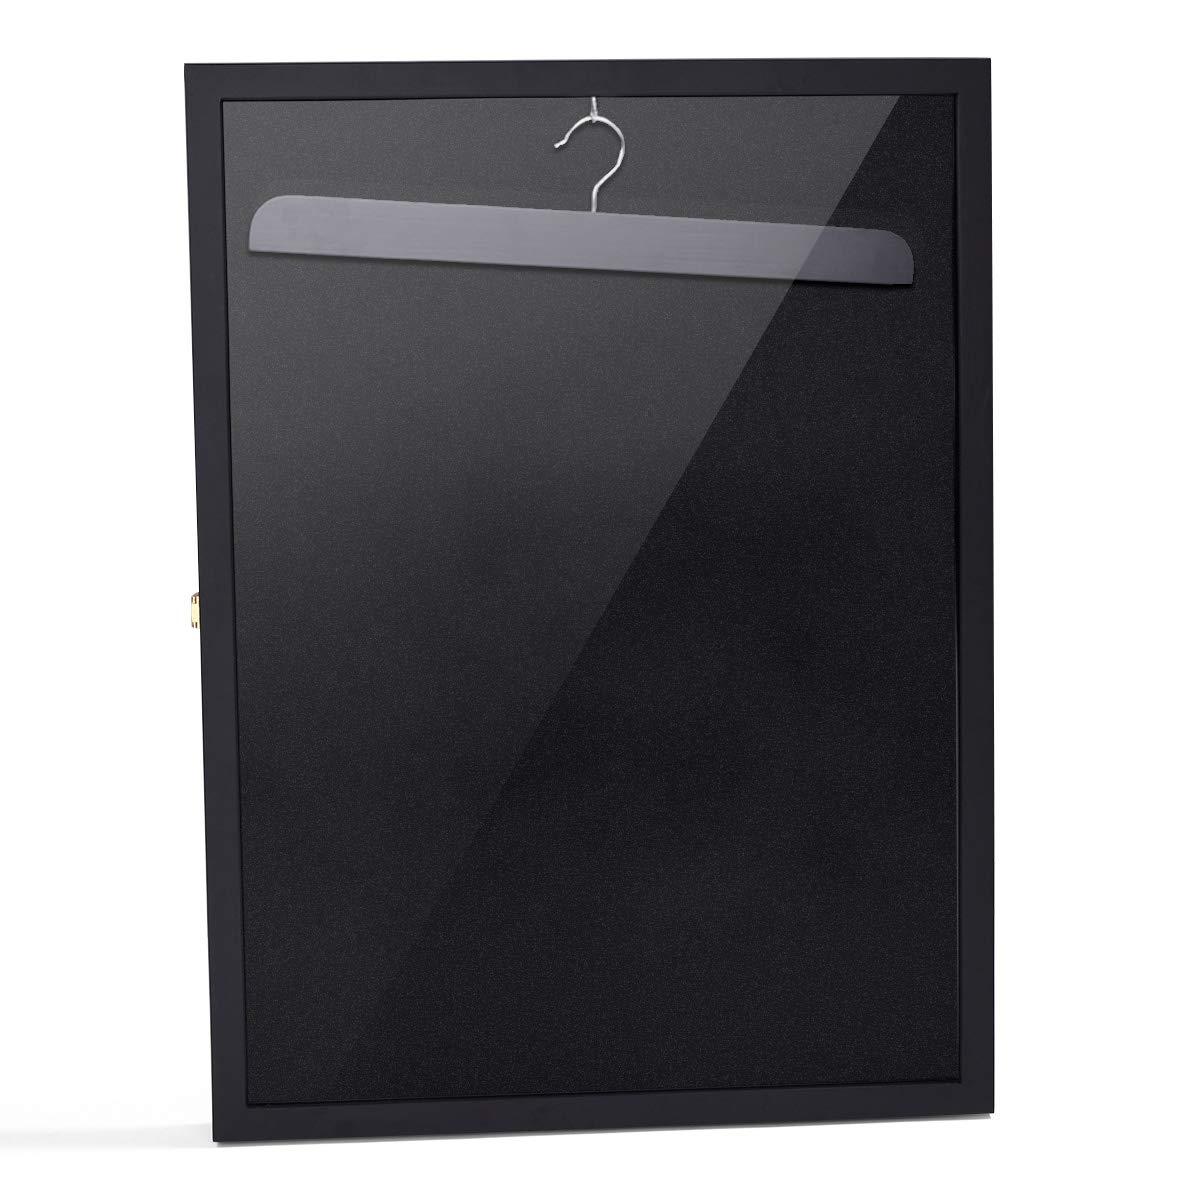 betterhomechoice Black Sports Jersey Frame Box Wall Display/Case Rack Frame Locable (Black) by betterhomechoice (Image #2)